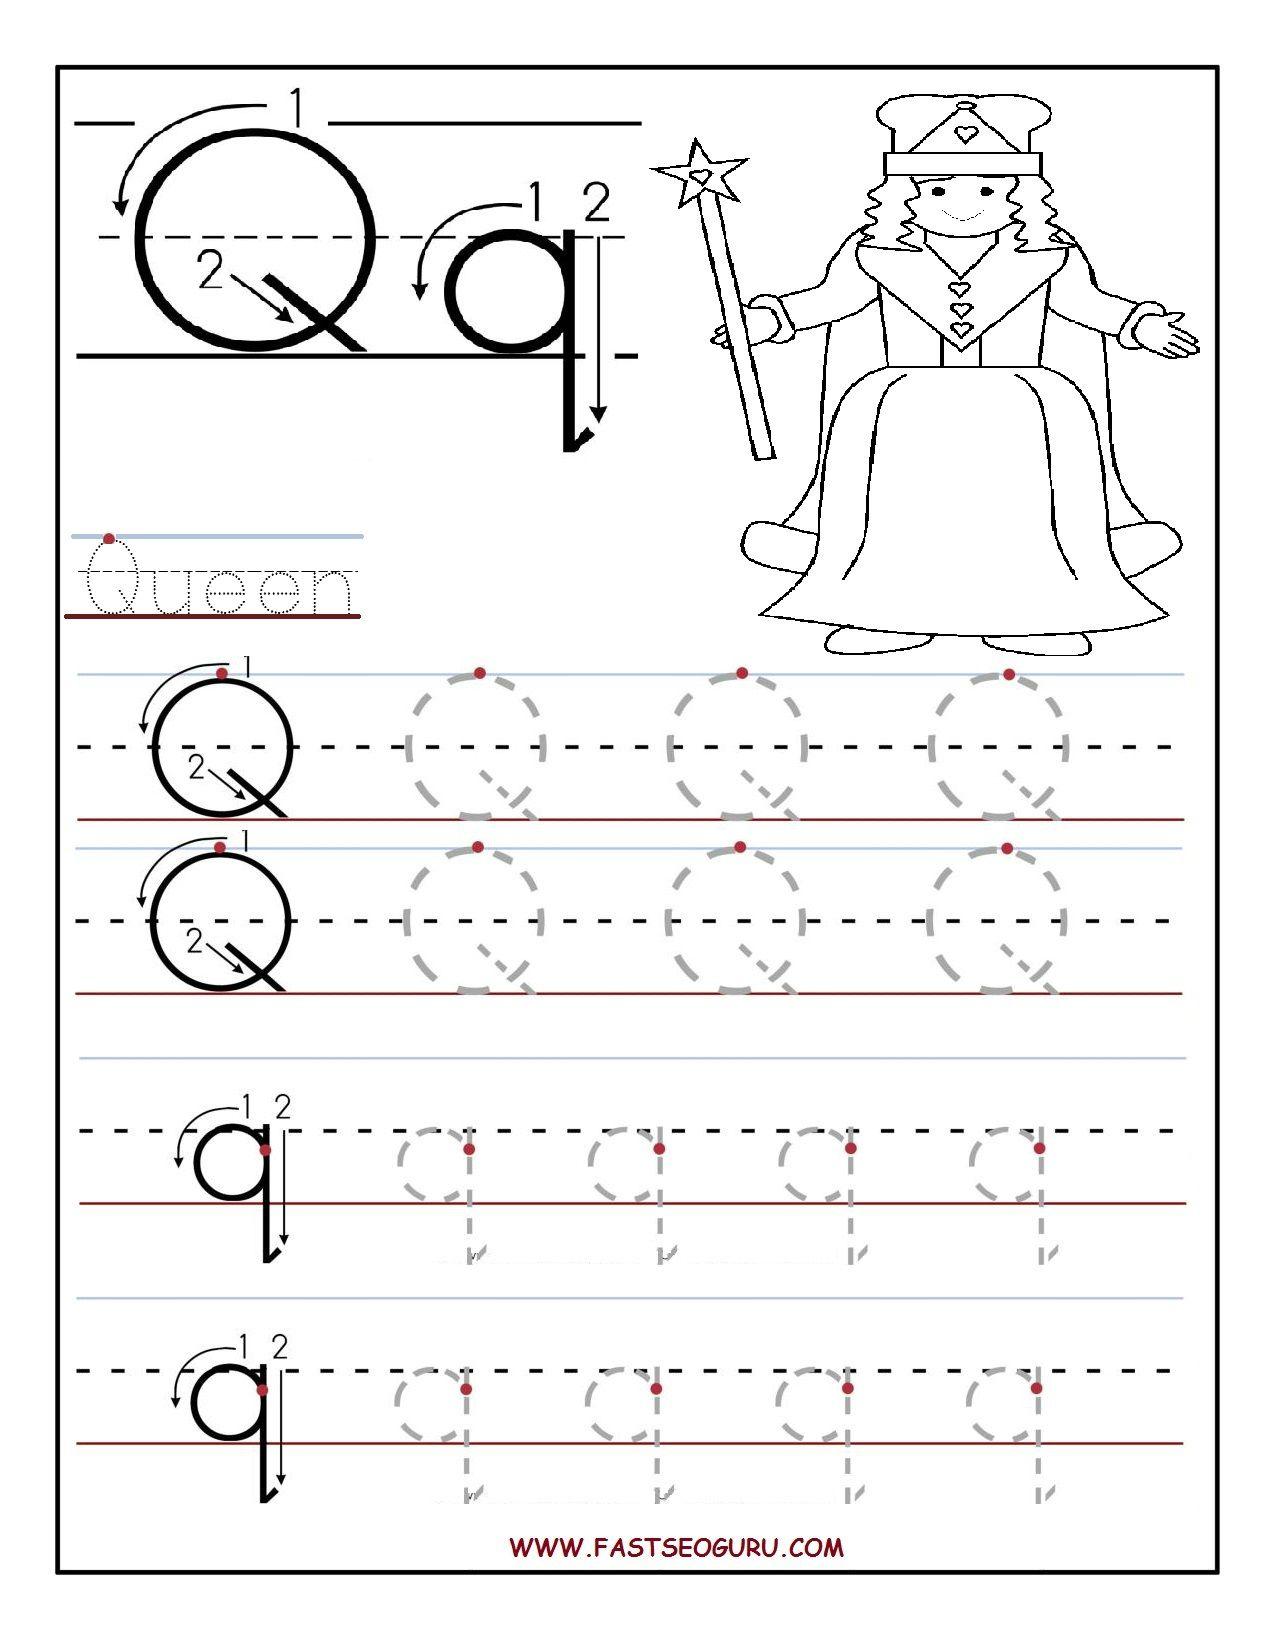 Printable Letter Q Tracing Worksheets For Preschool